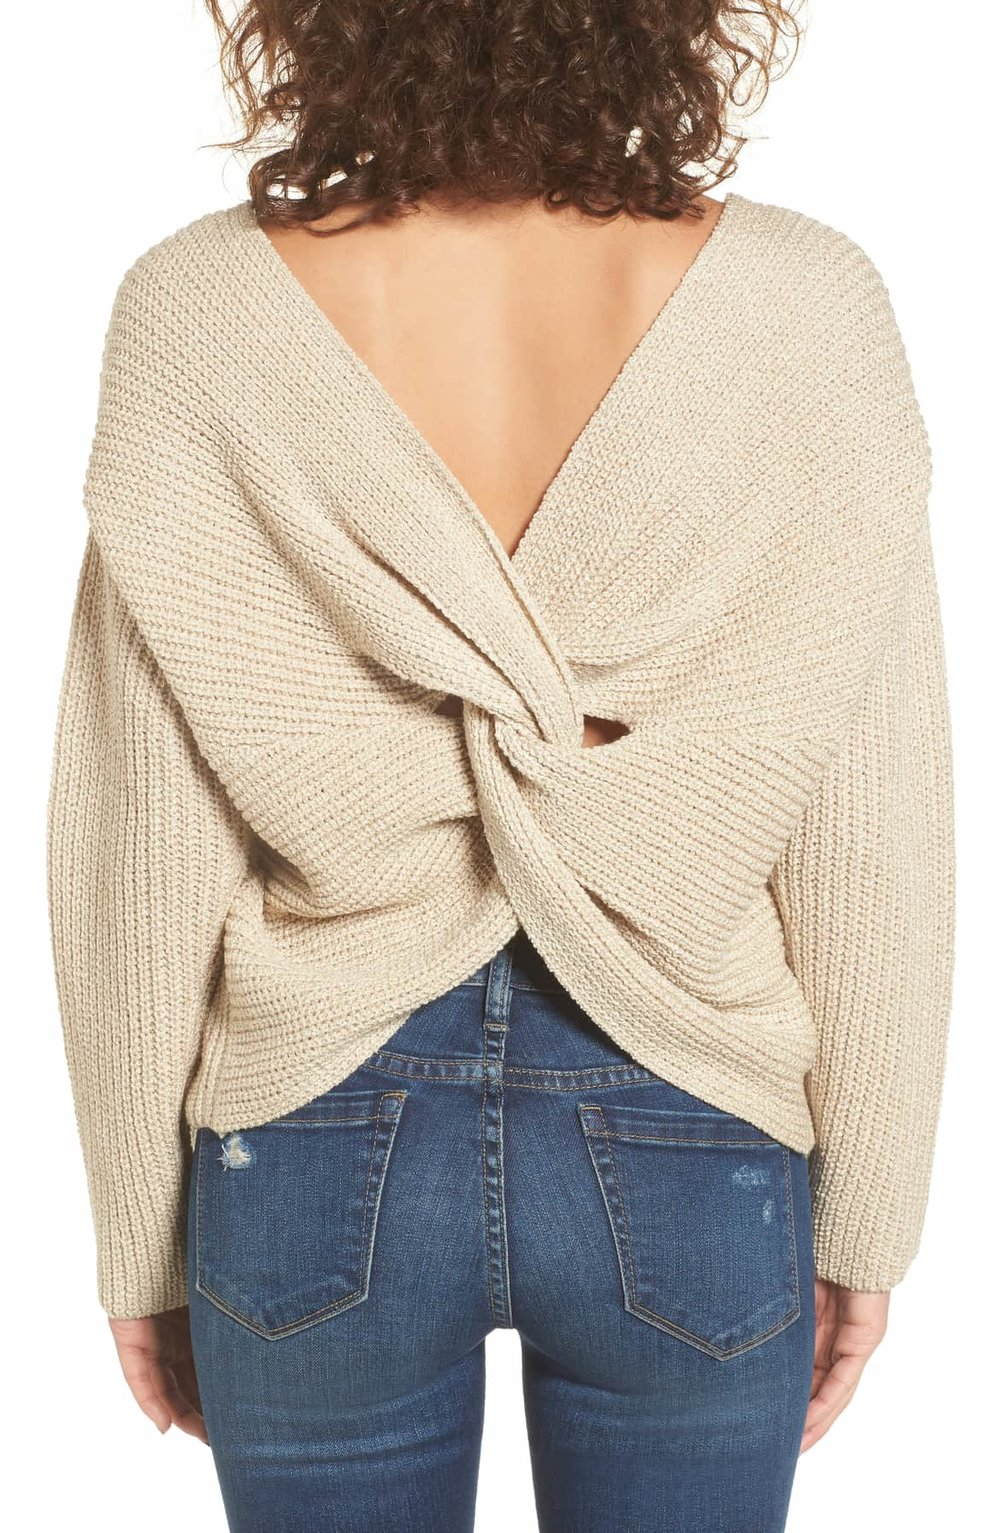 ASTR THE LABEL Twist Back Sweater.jpeg